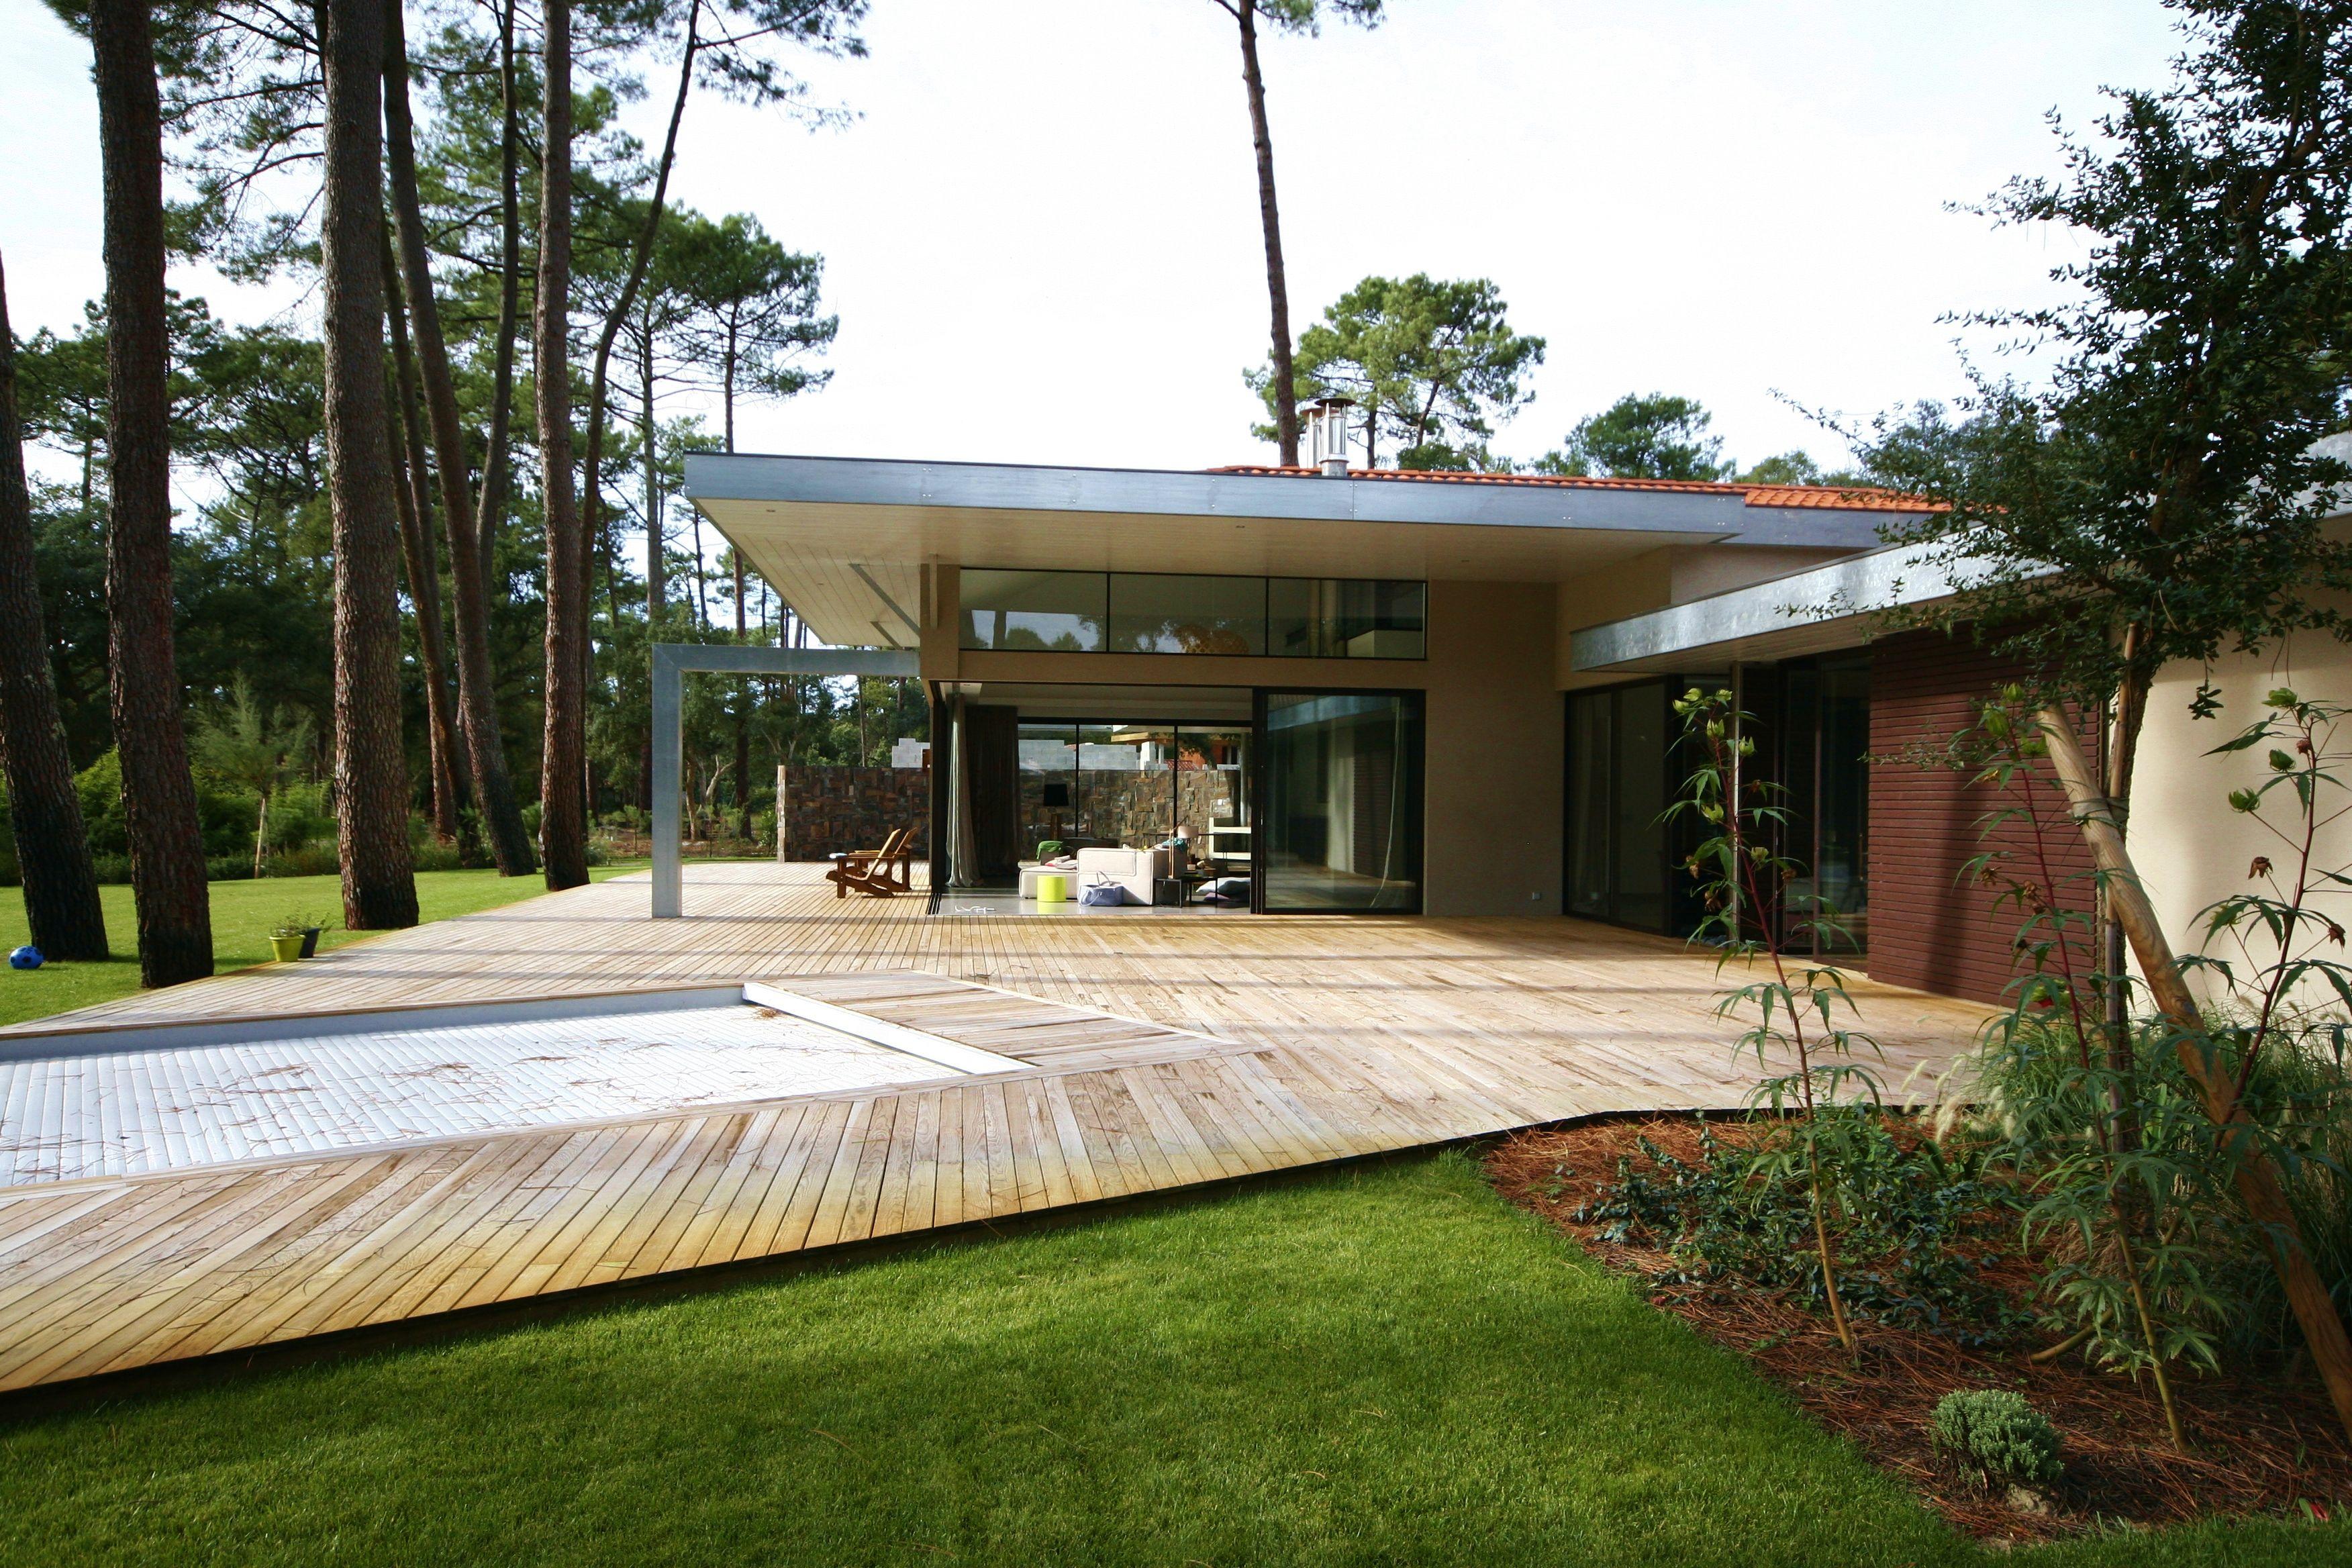 Architecture contemporaine Hossegor, Landes -Atelier Luc Germain | Architecture contemporaine ...